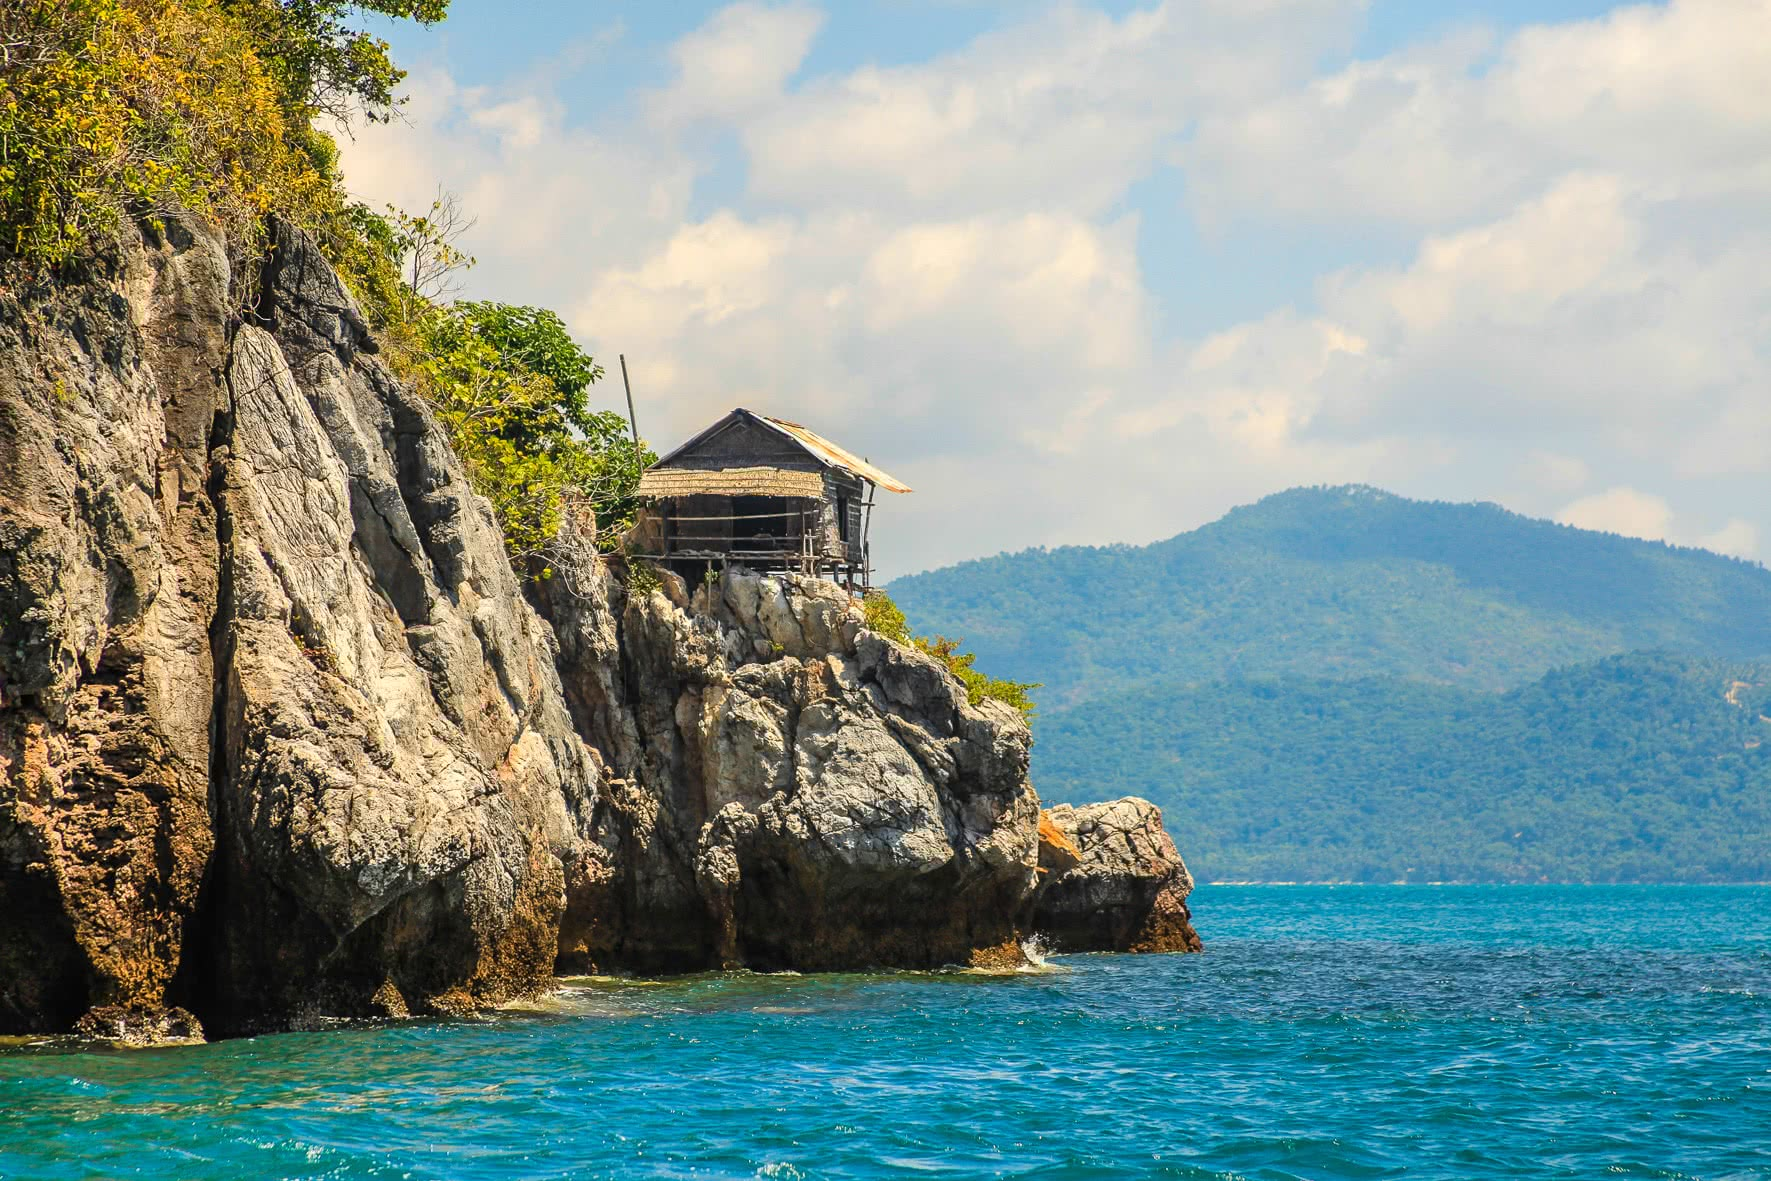 Jet ski safari from Koh Samui to neighbouring islands, Koh Samui, Thailand